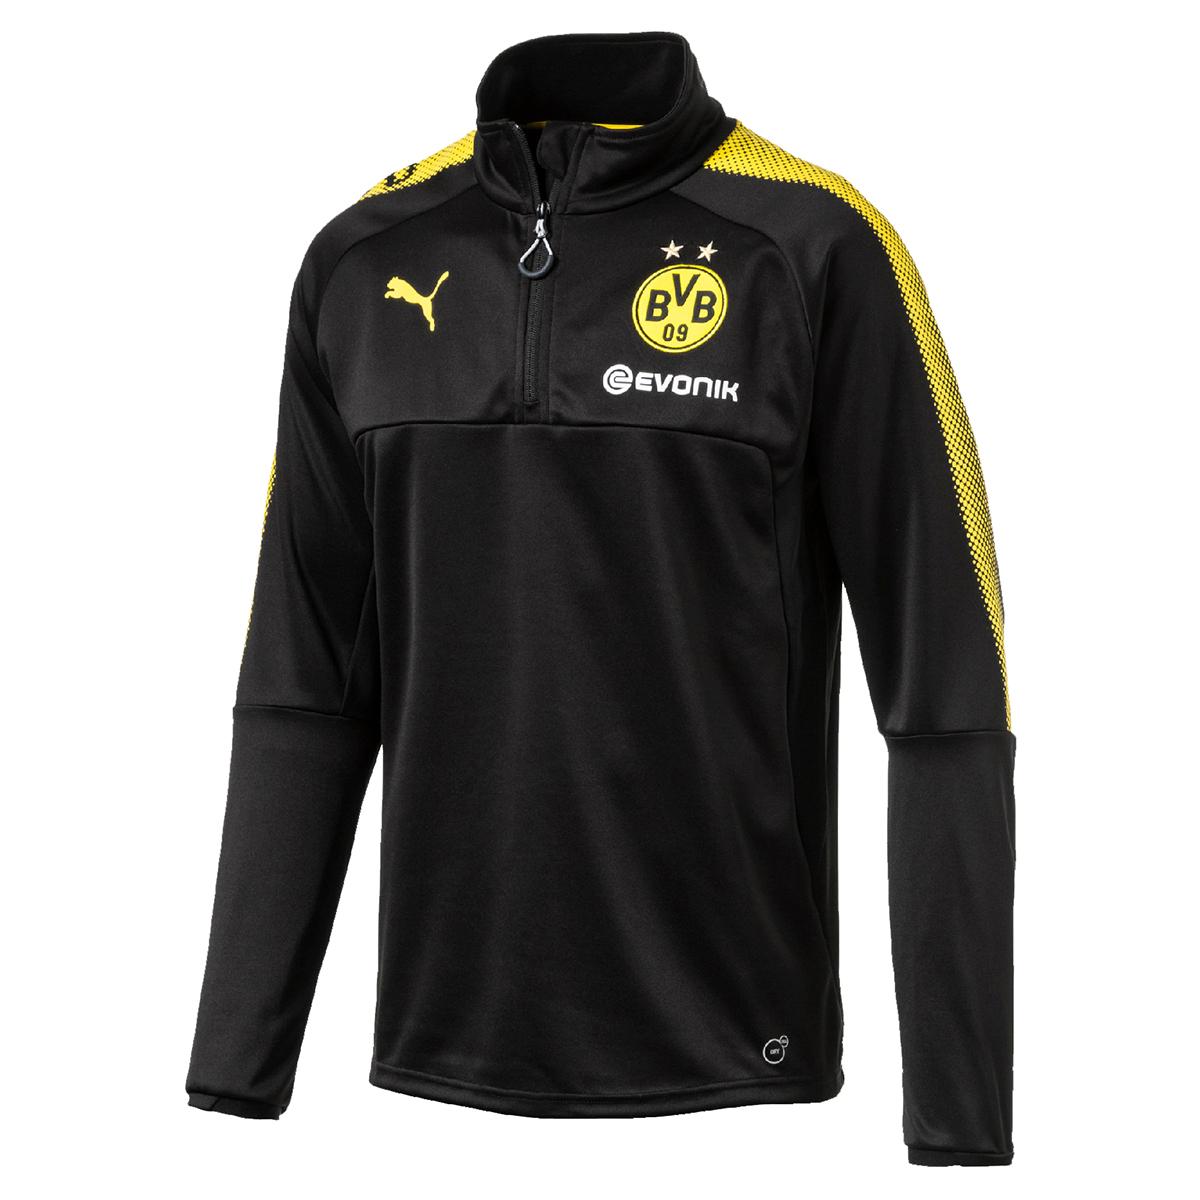 Puma BVB Borussia Dortmund Sweatshirt 1/4 Zipper oder Hoody für 19,99€ @ Sneakerprofi